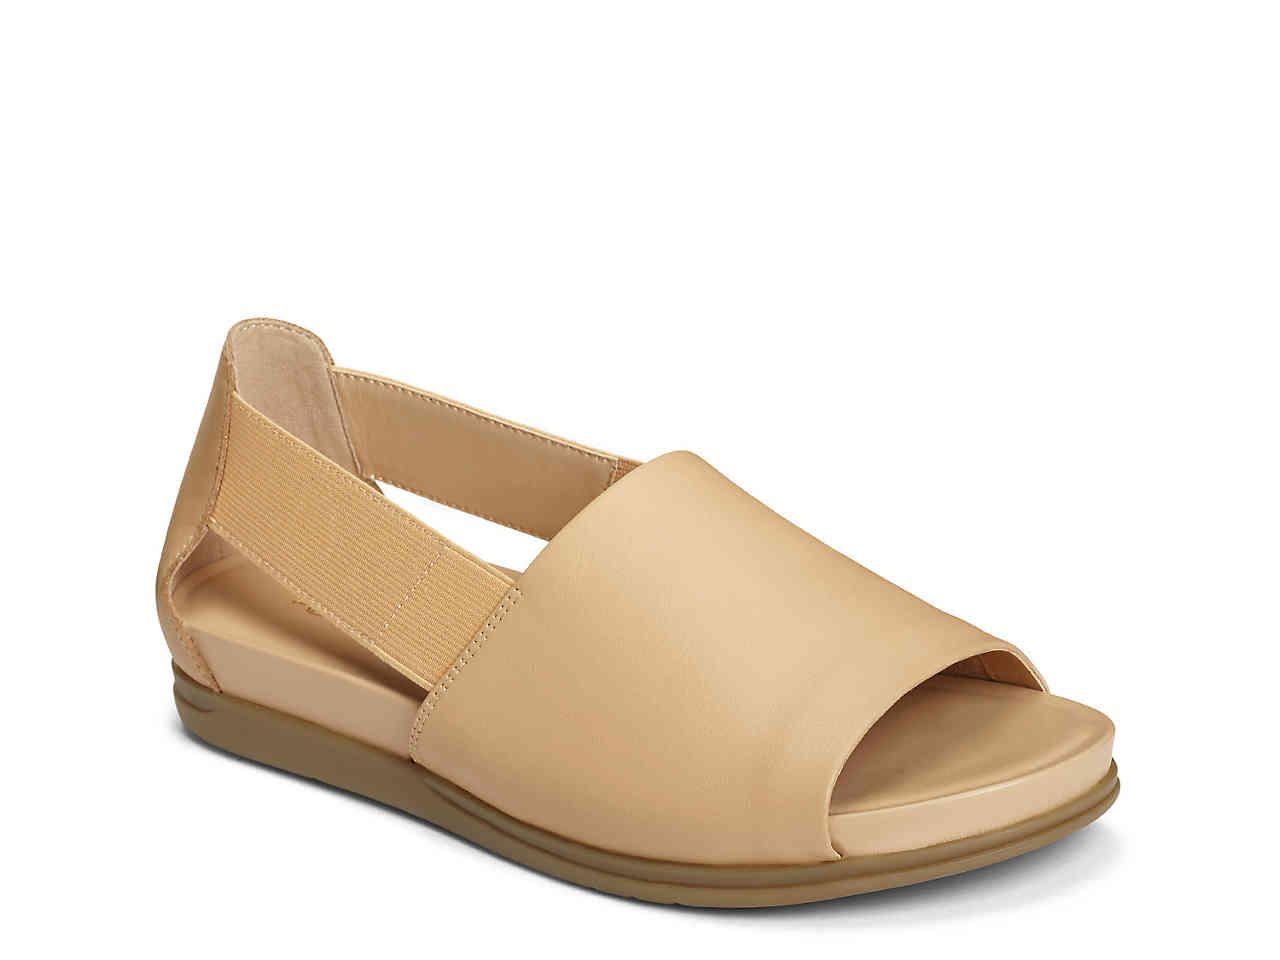 Aerosoles Hour Glass Sandal | Sandals